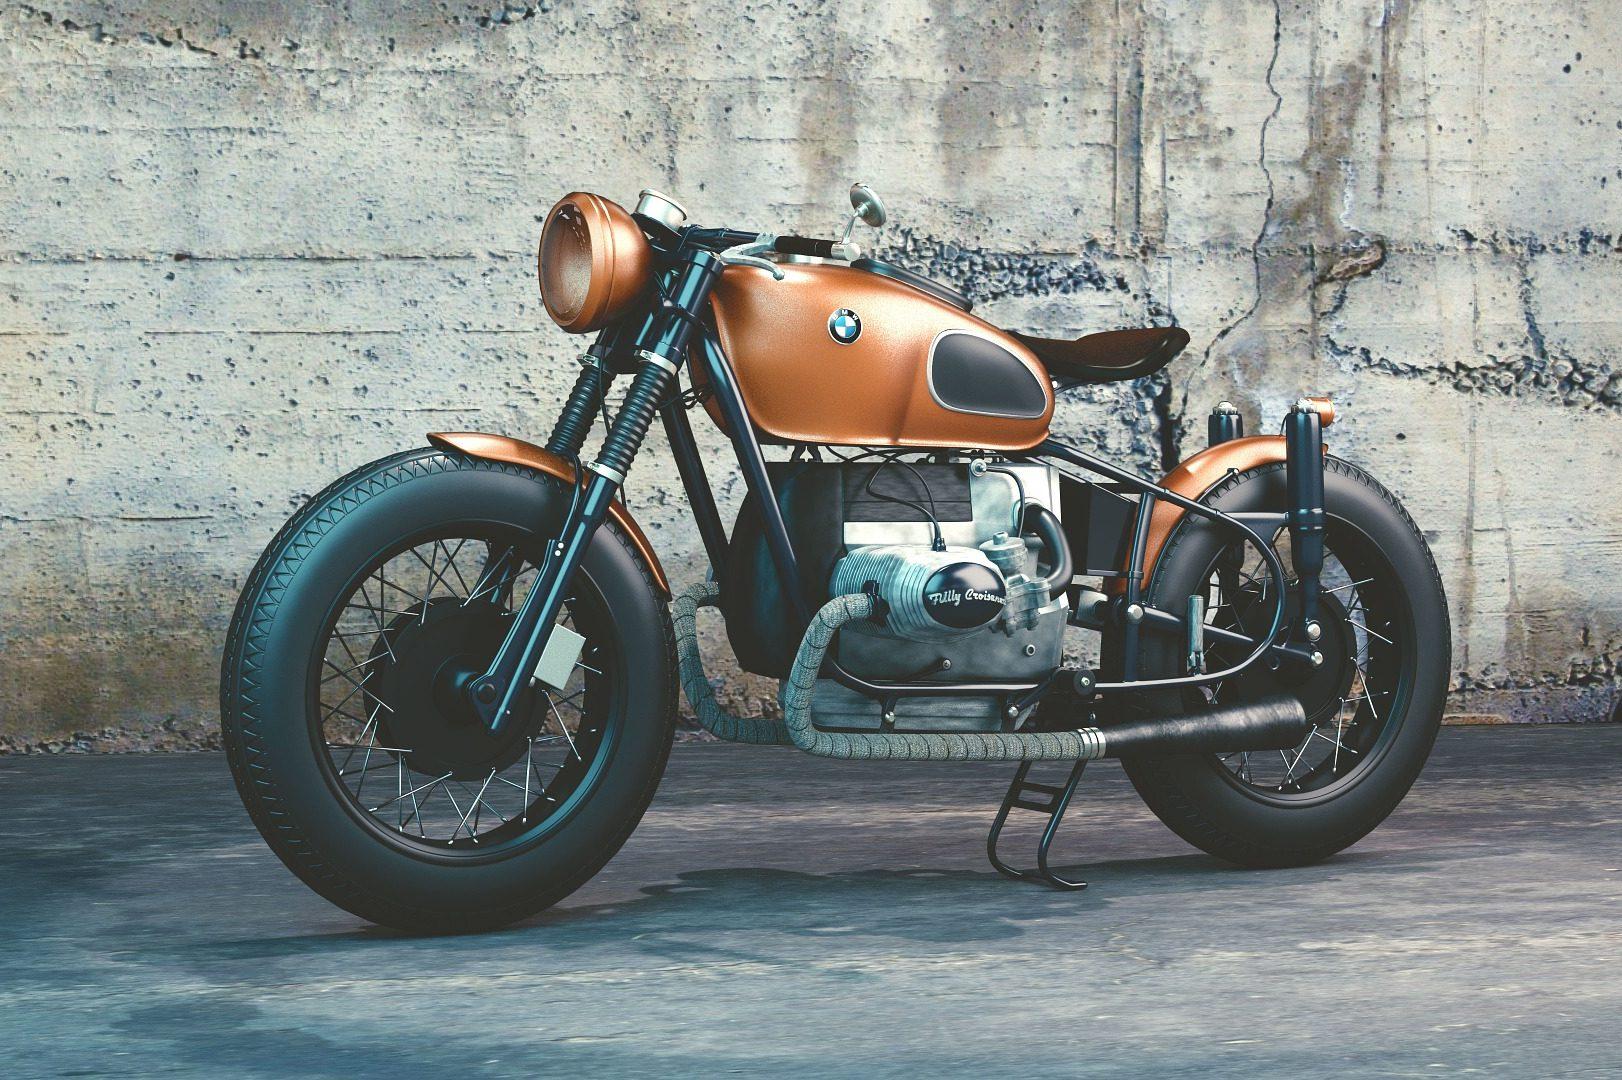 Rêver de moto